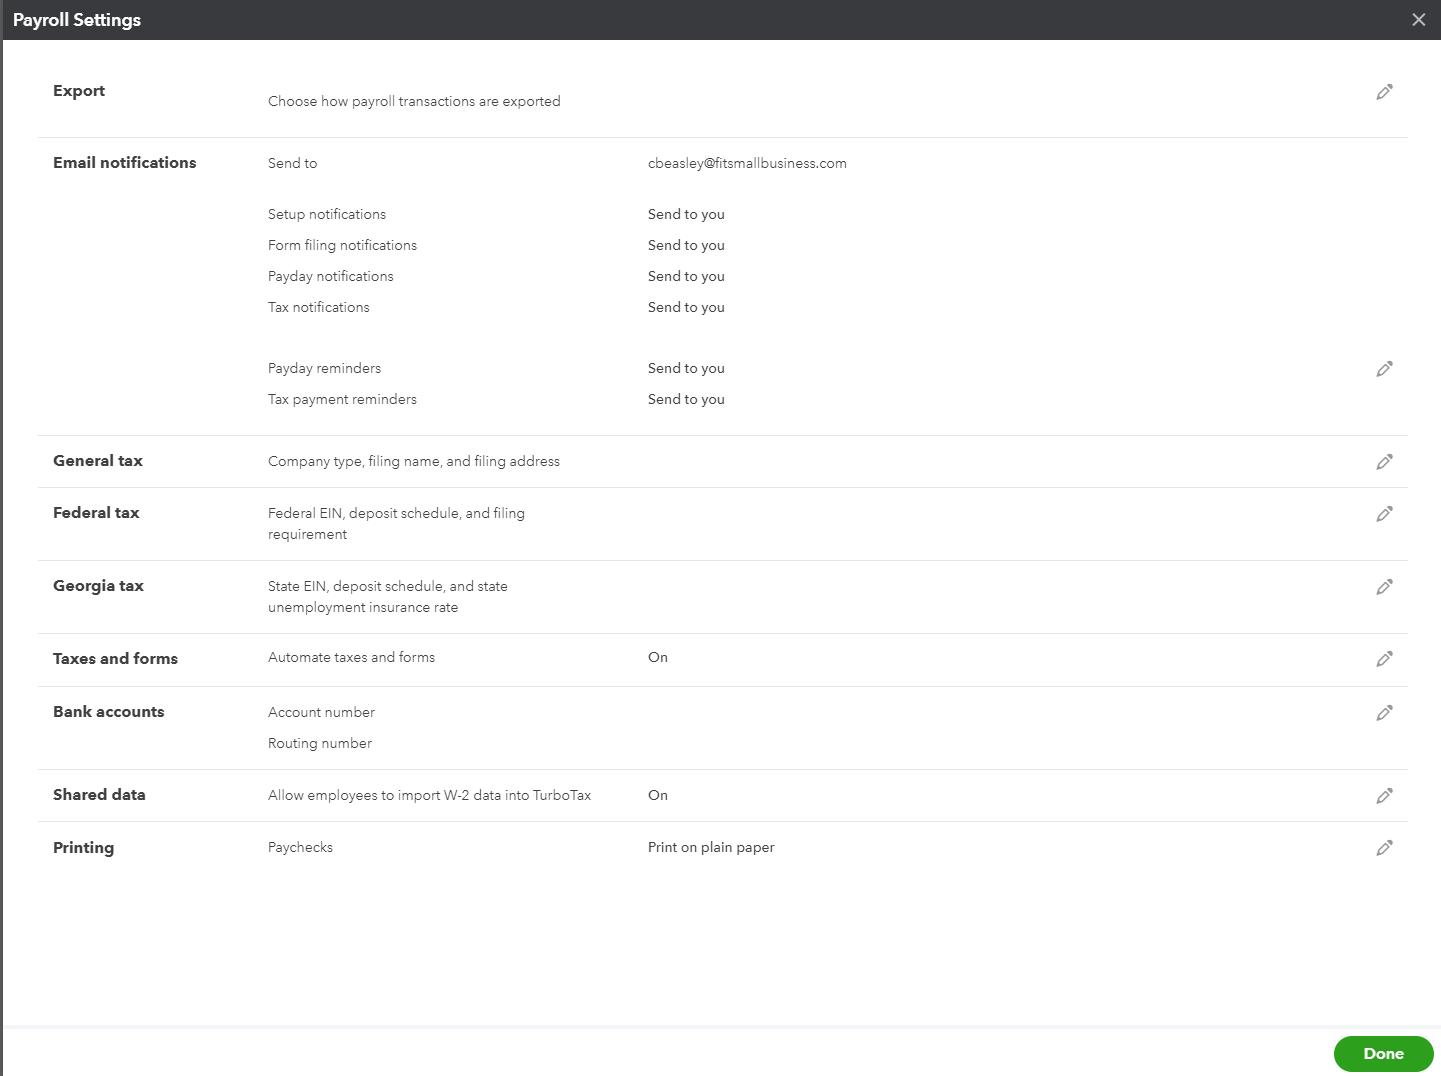 Screenshot of Payroll Settings Display on QuickBooks